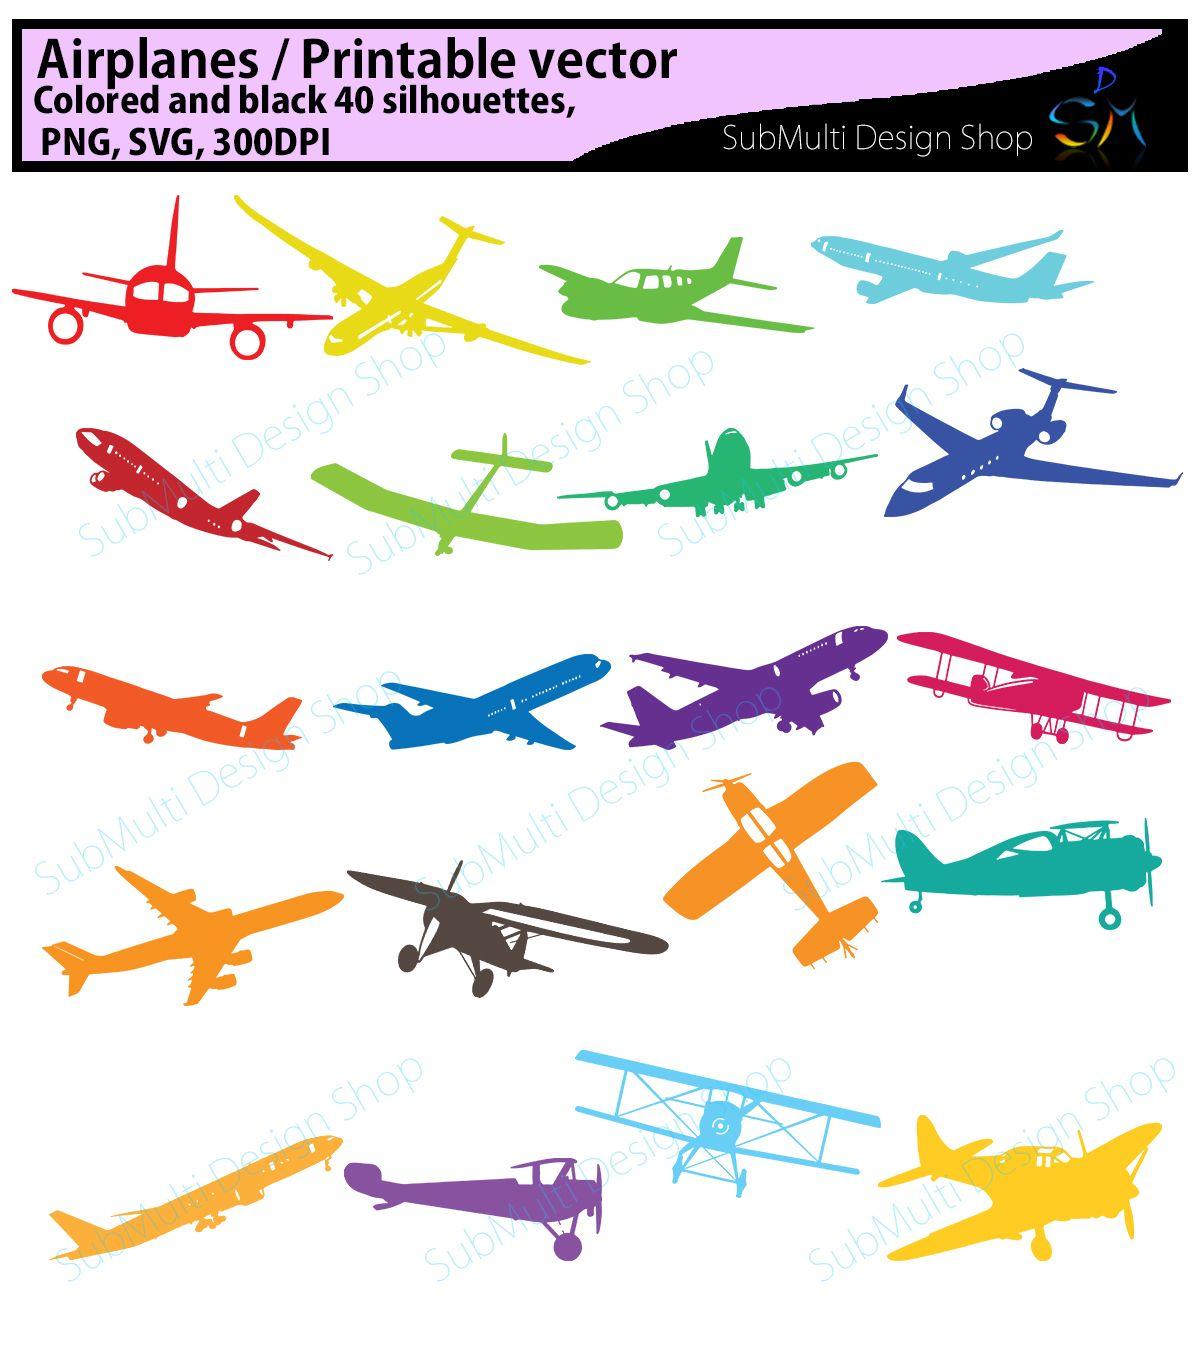 medium resolution of airplane clipart svg airplane airplane clipart airplane craft airplane graphics airplane silhouette cricut cut files design fly logo minimal